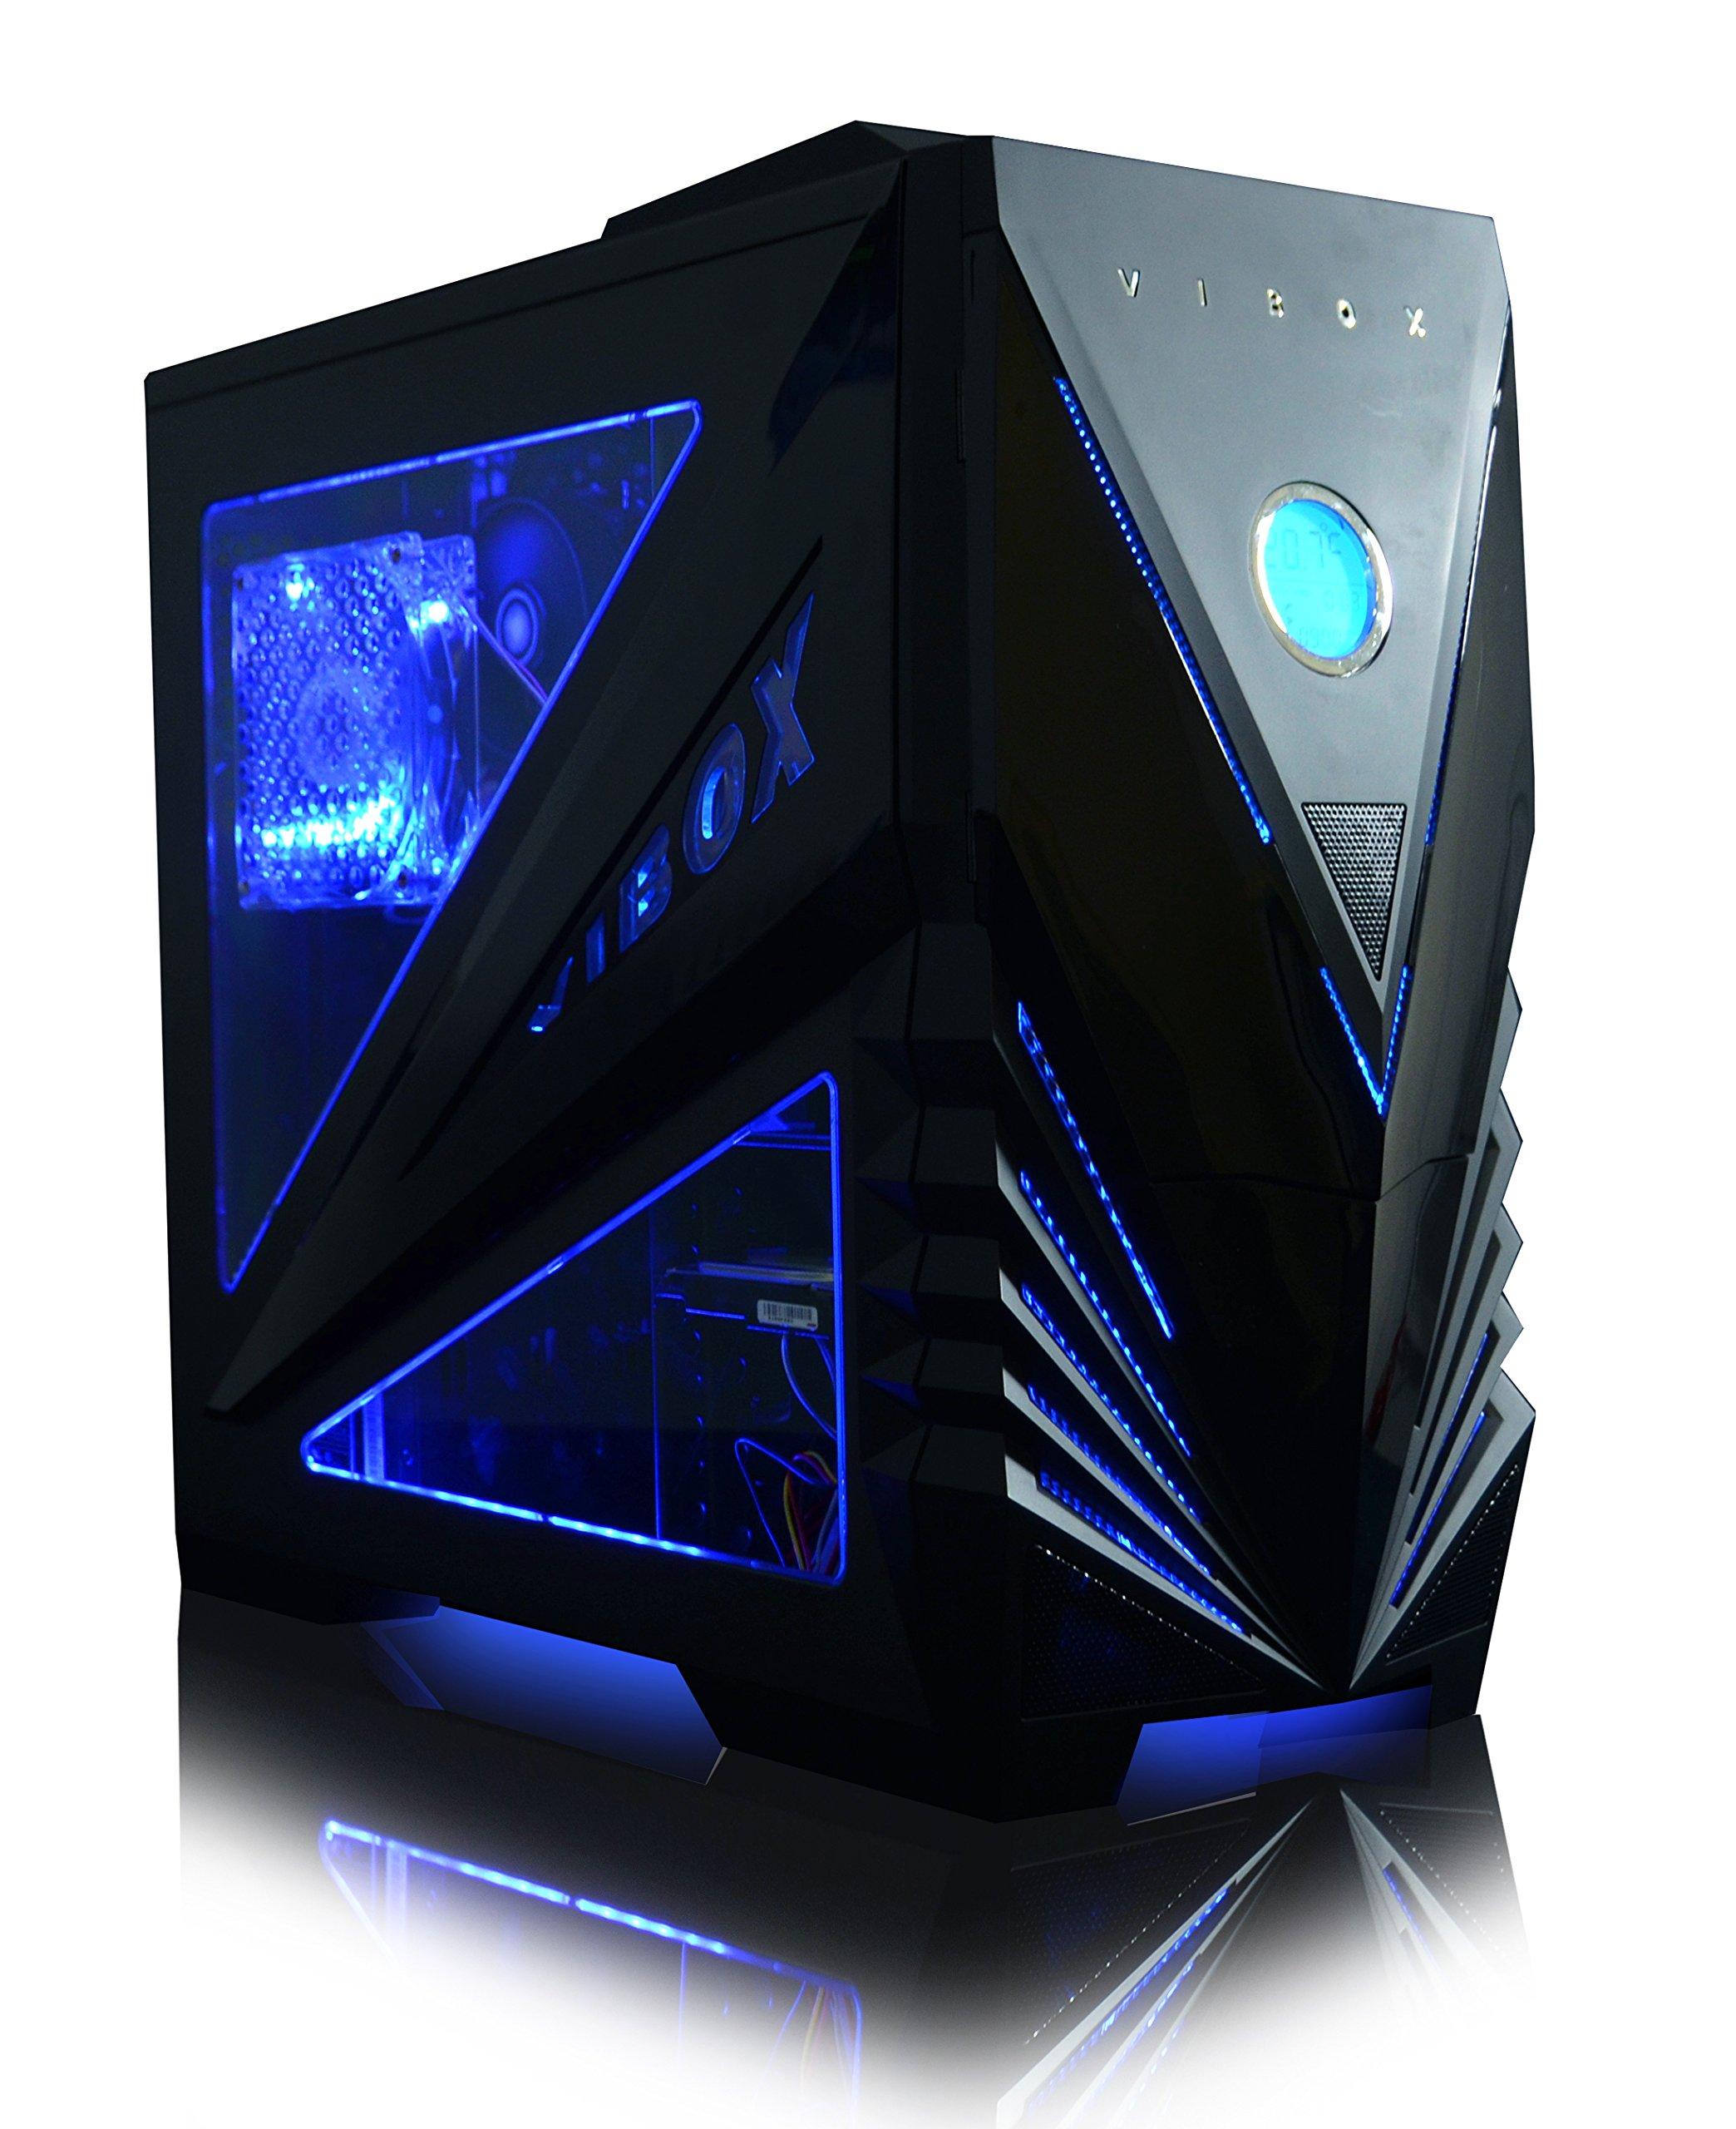 Vibox Legend 26 Gaming-PC Computer mit 2 Gratis-Spielen, Windows 10 OS, 27 Zoll HD Monitor (4,4GHz AMD Ryzen 6-Core…